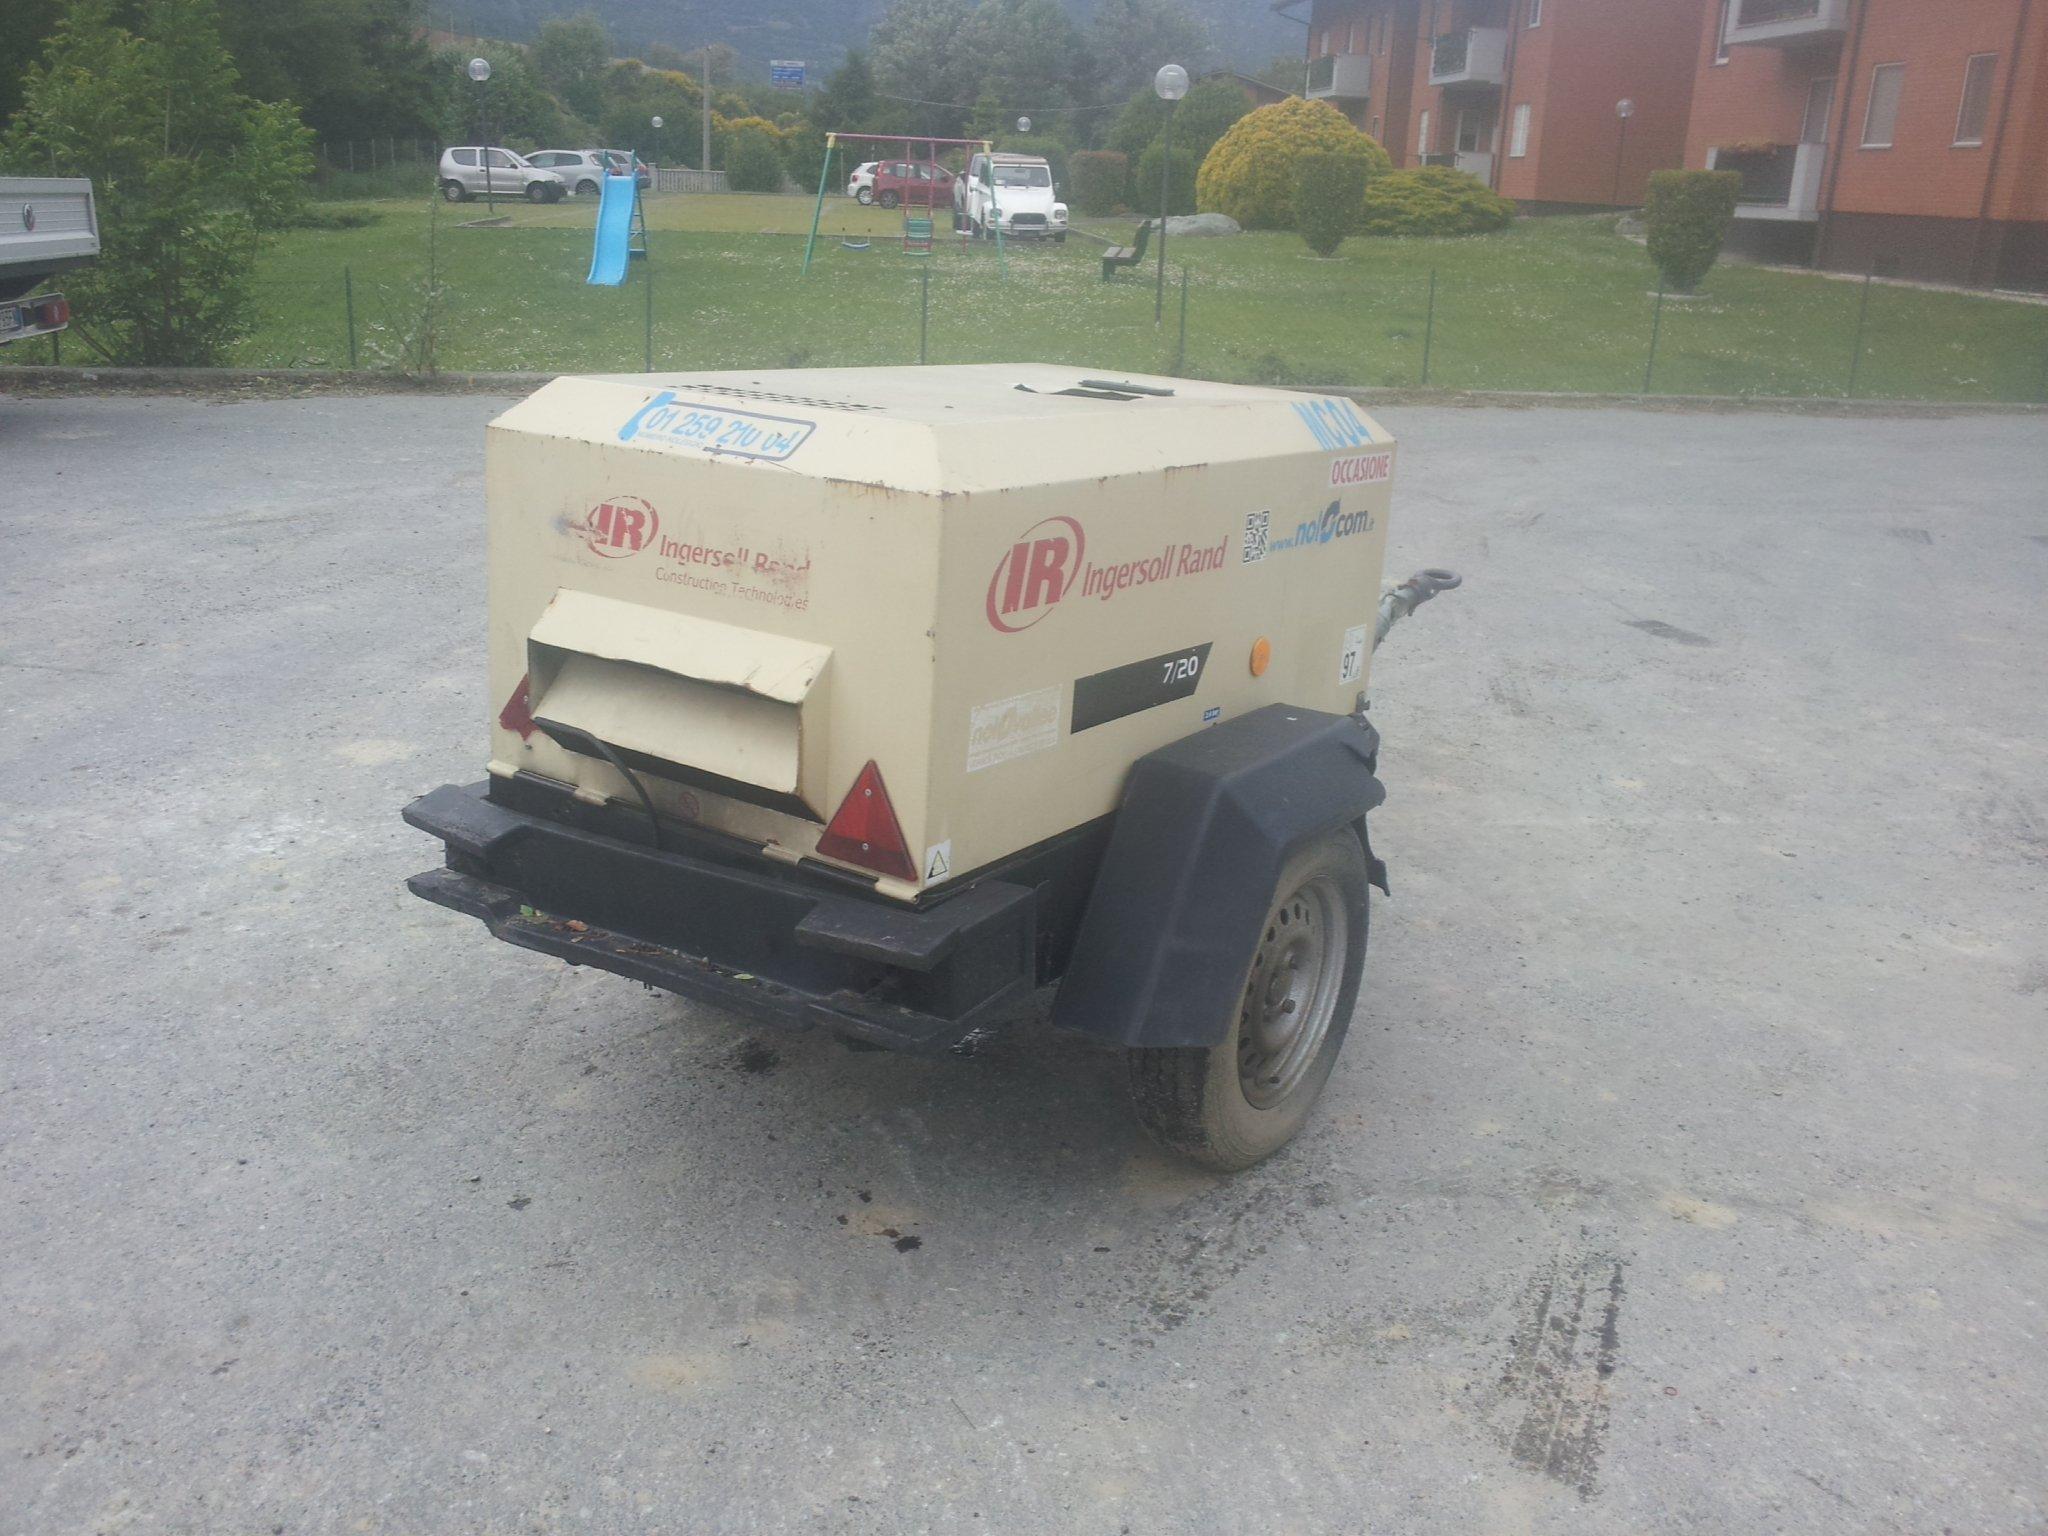 UEXMC004 – MOTOCOMPRESSORE 7/20 2100 Lt